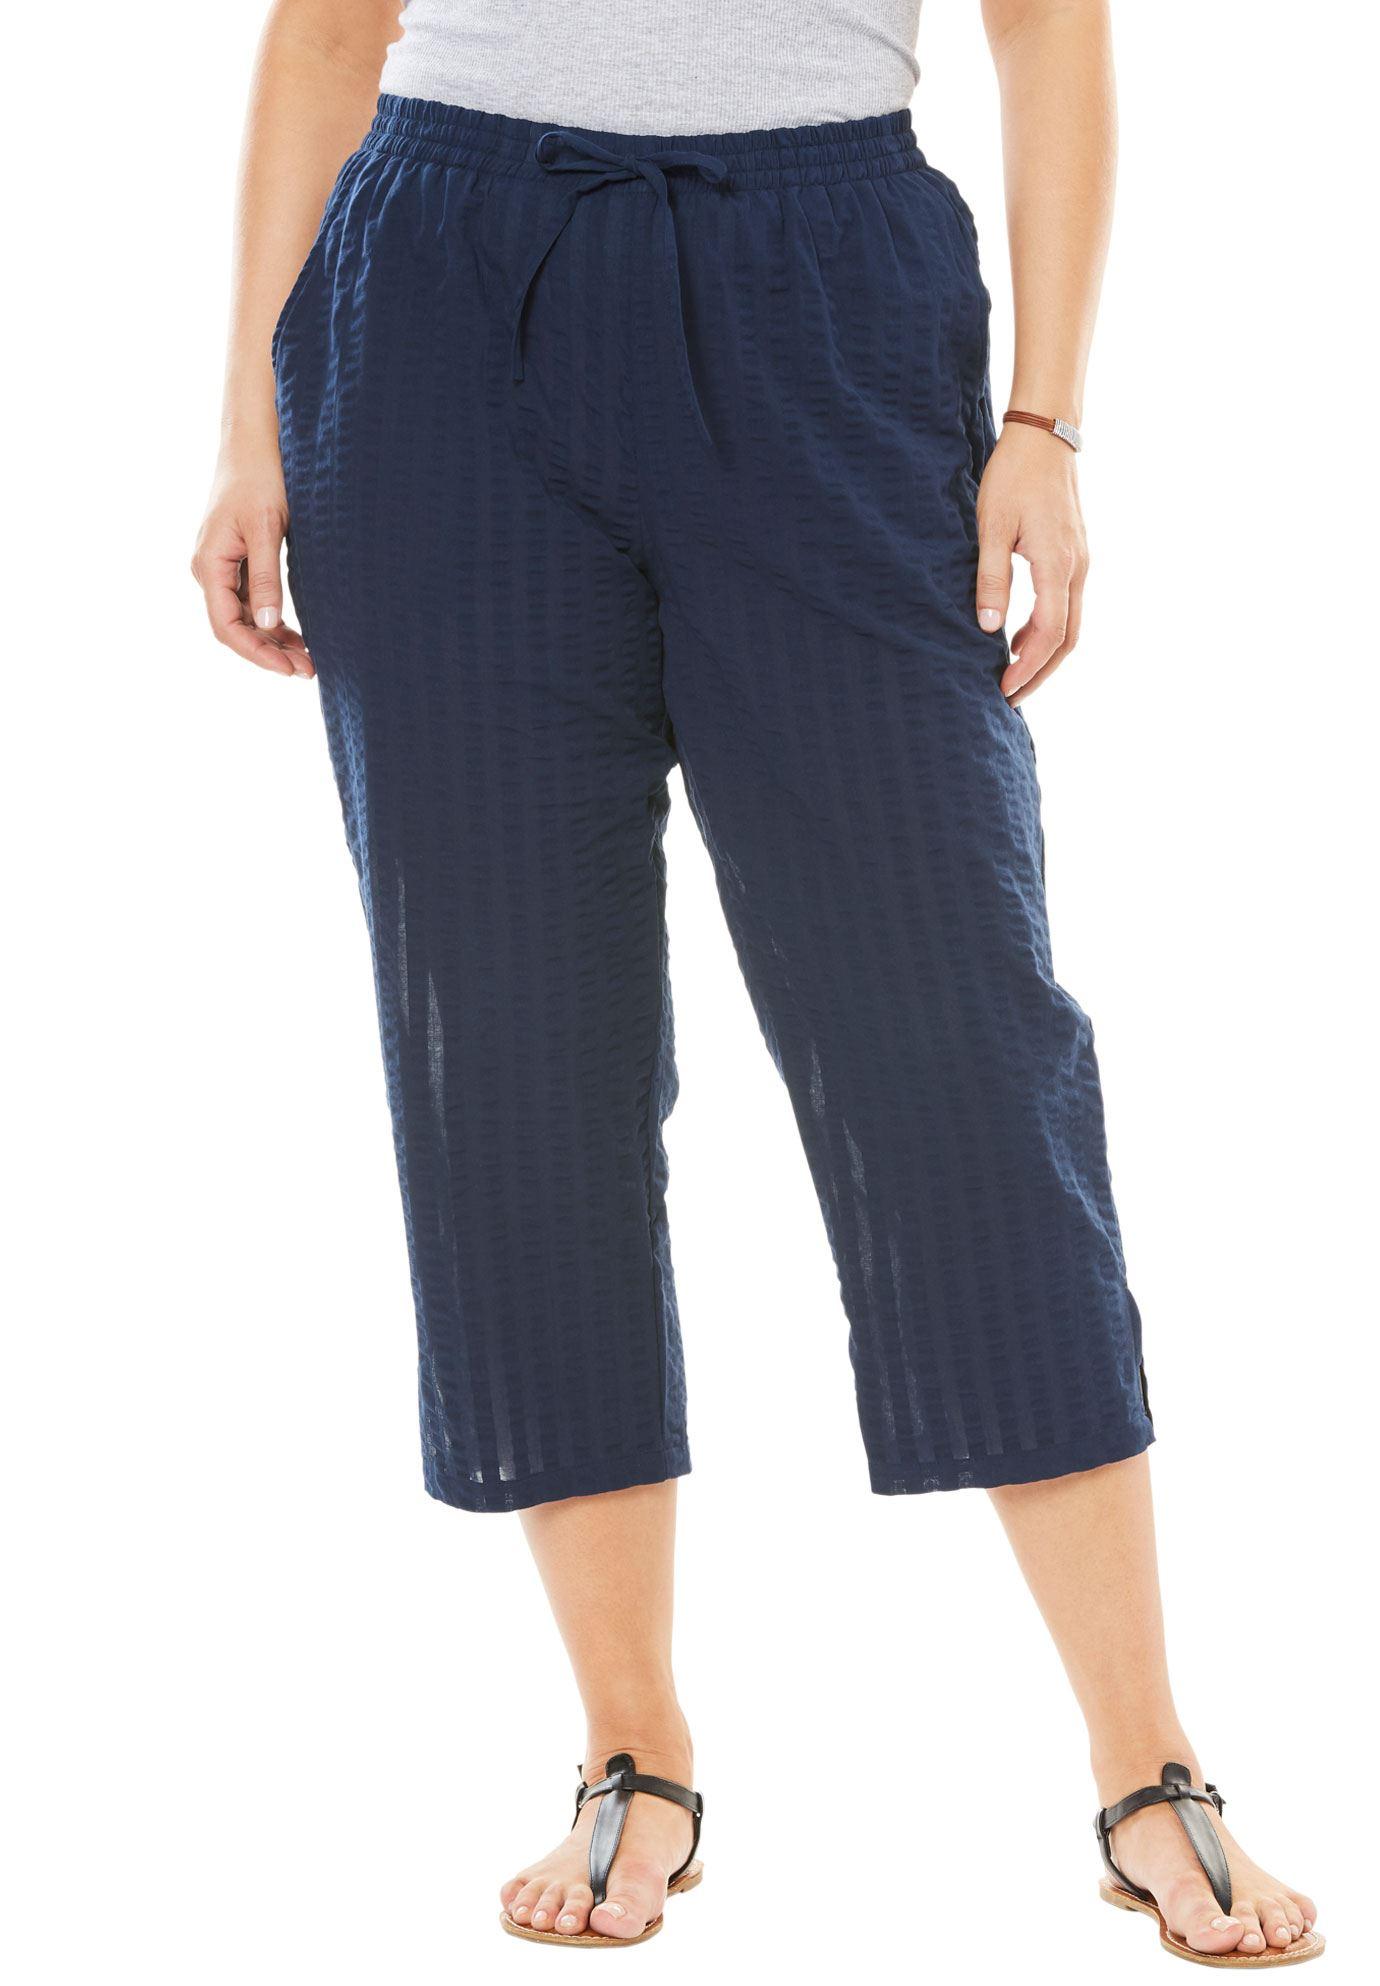 Petite Seersucker Capri Pants Women S Plus Size Clothing Pants